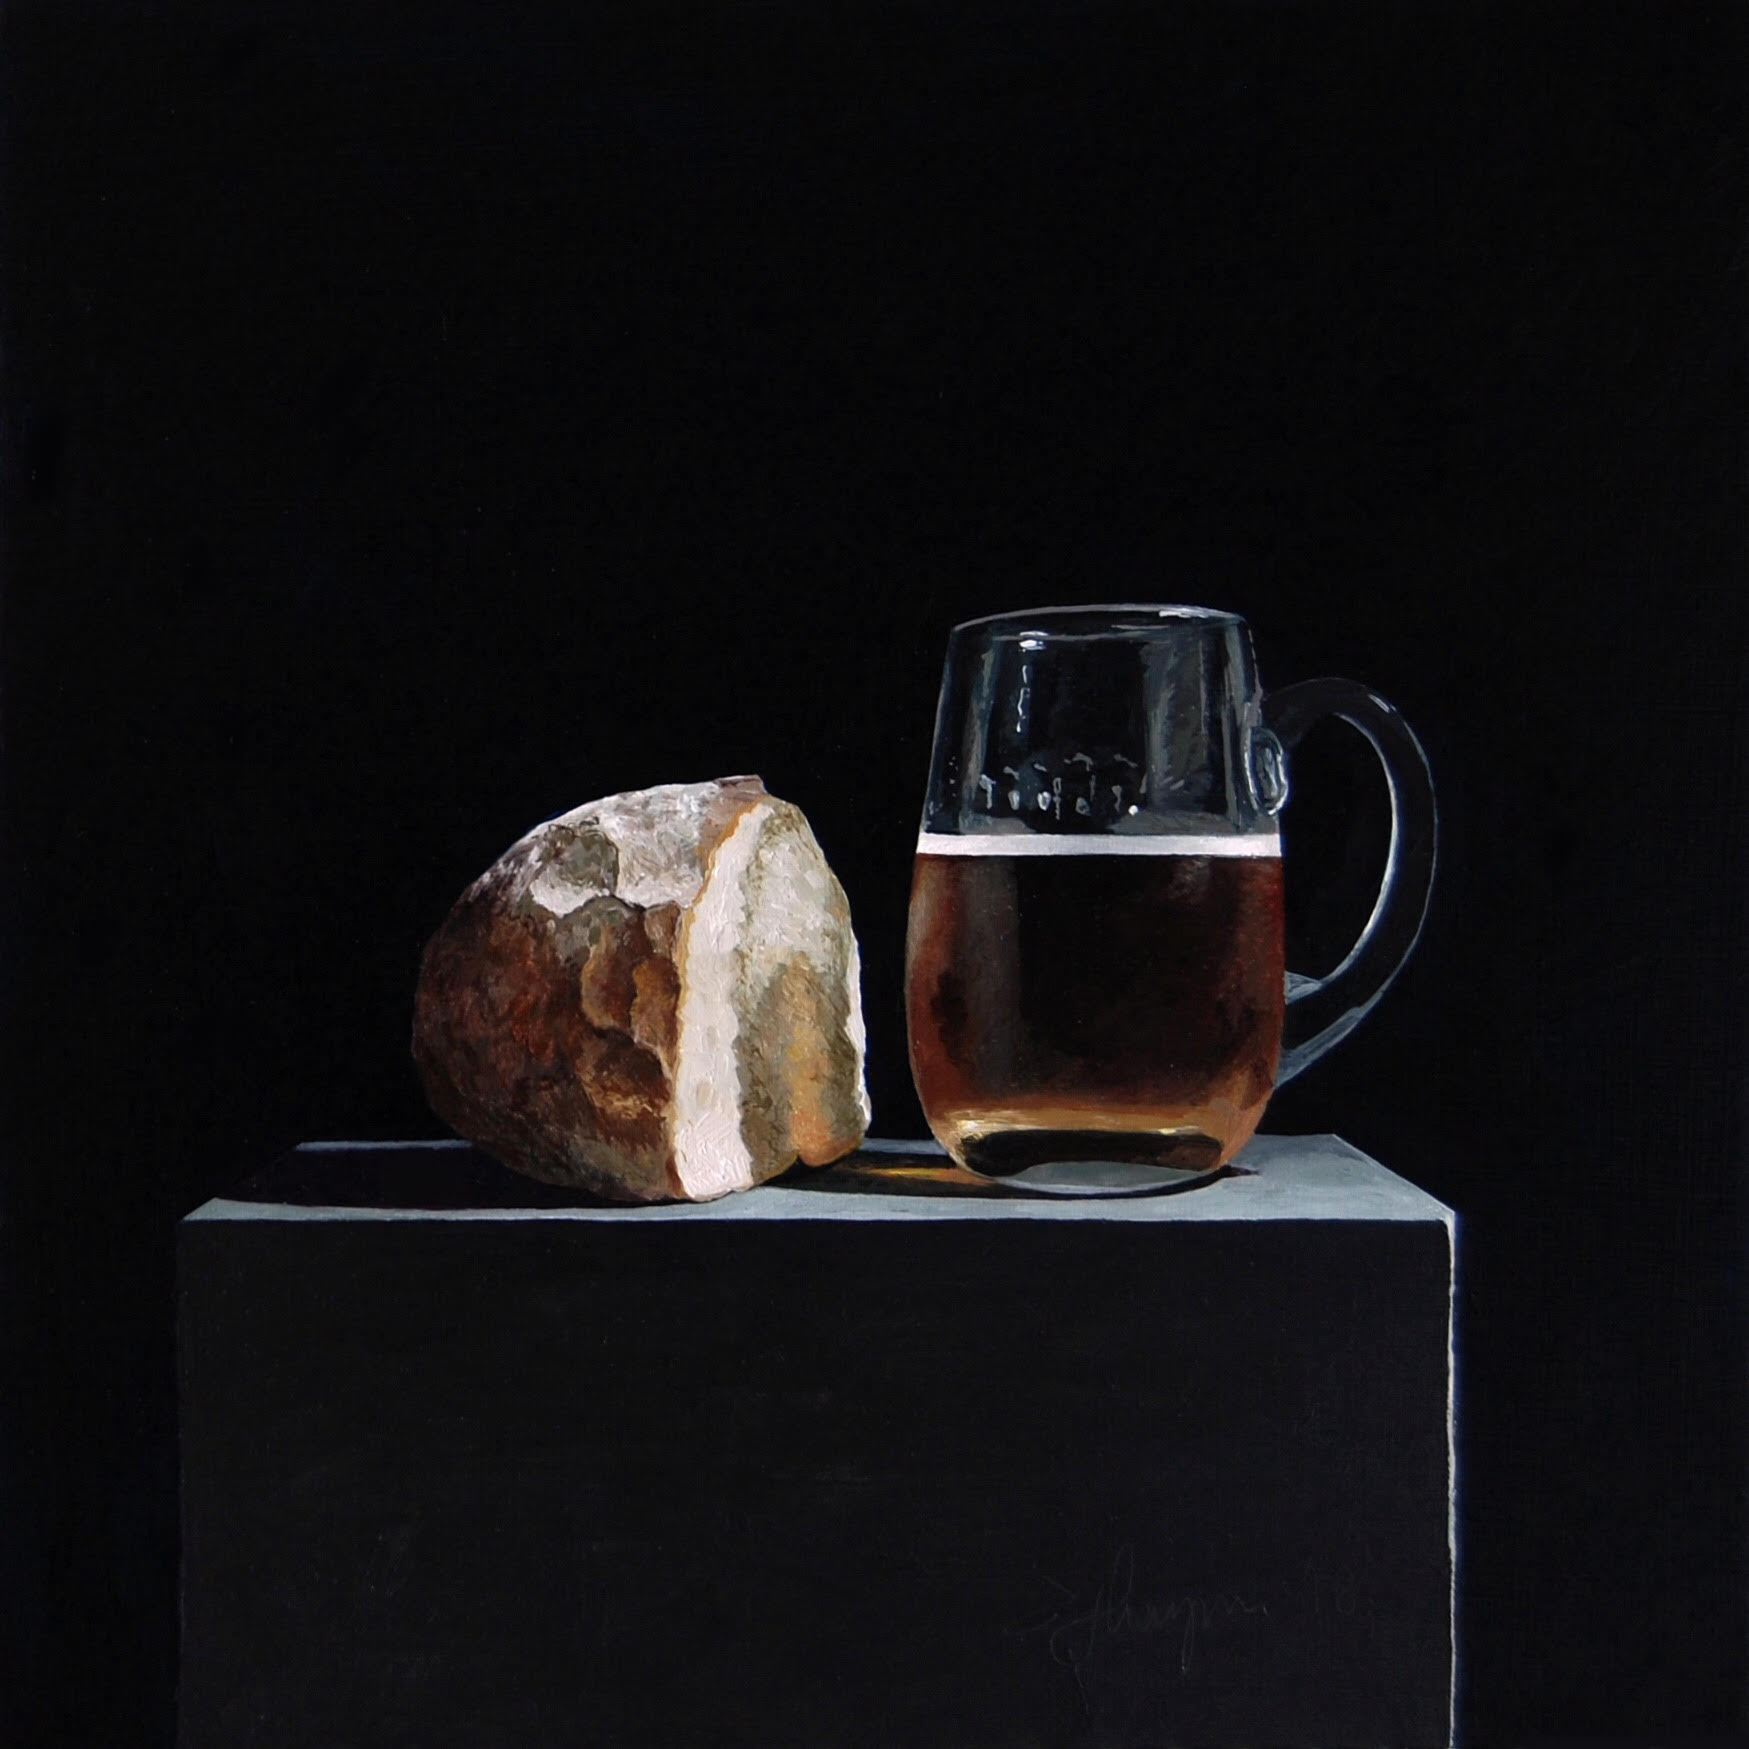 "Beer & bread, 10"" x 10"", Oil on Aluminium, 2018."